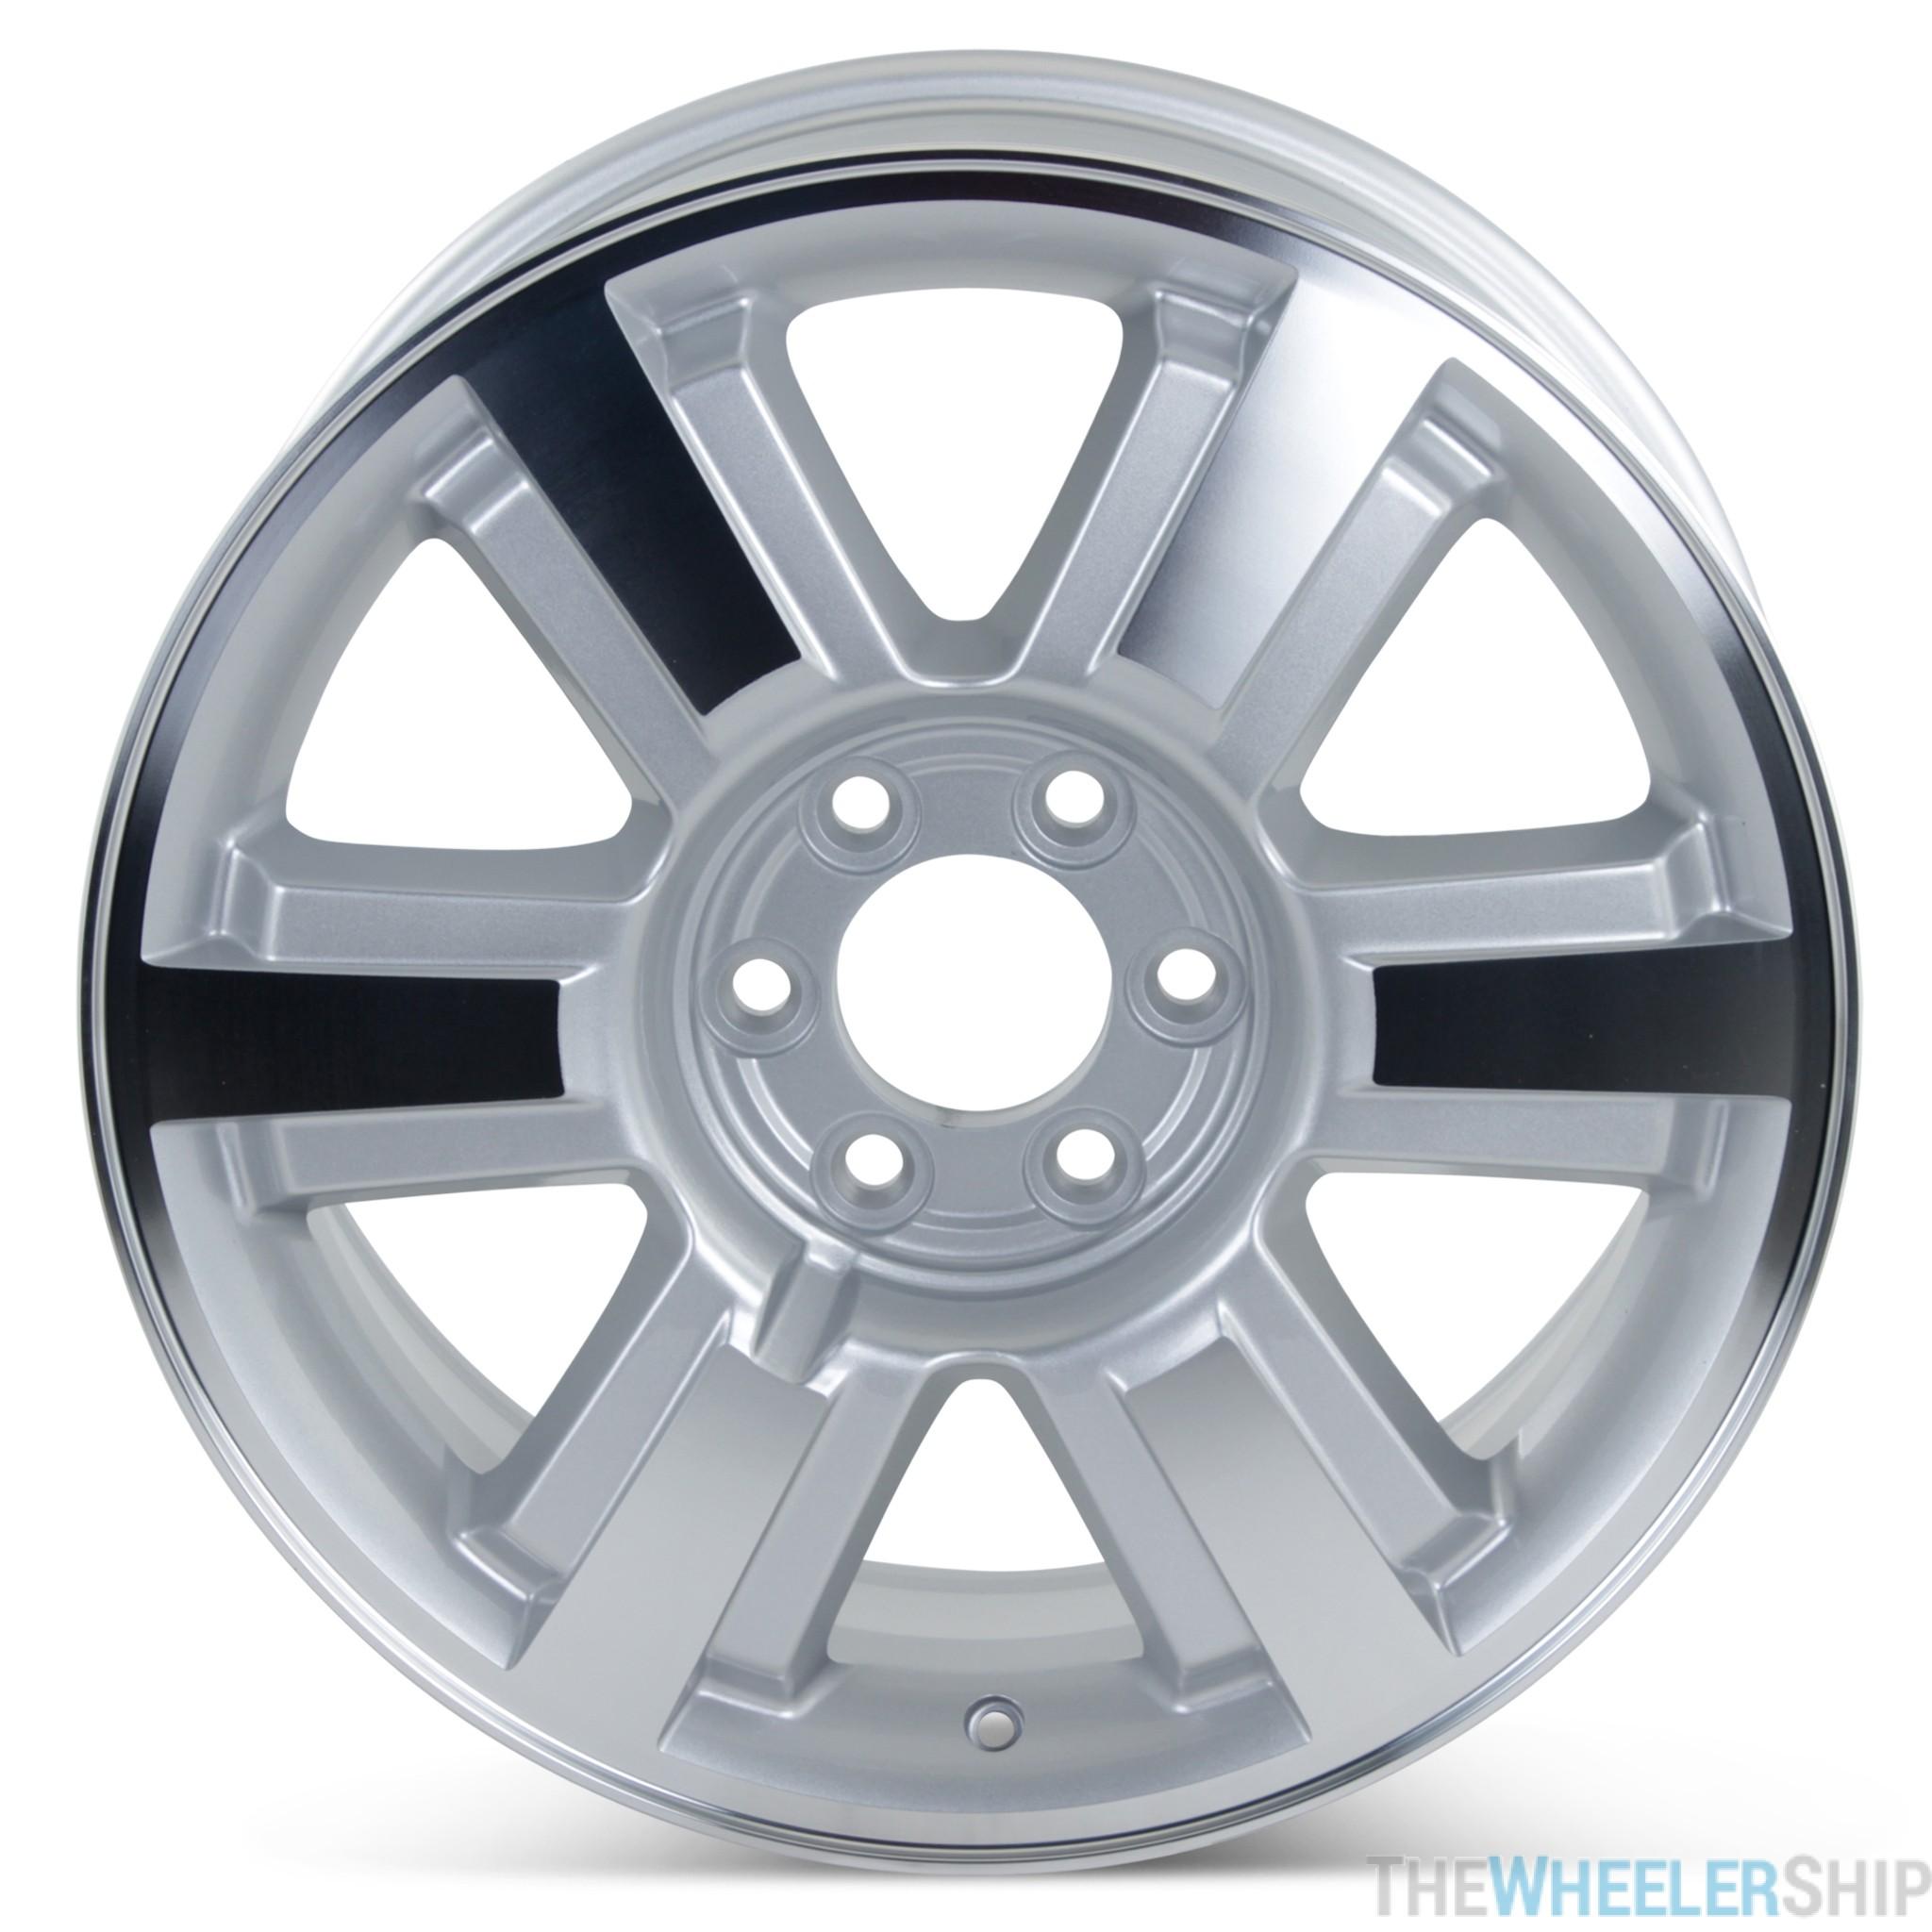 Ford F150 Wheels >> 2006 2008 Ford F150 Wheels 20 Inch F150 Wheels